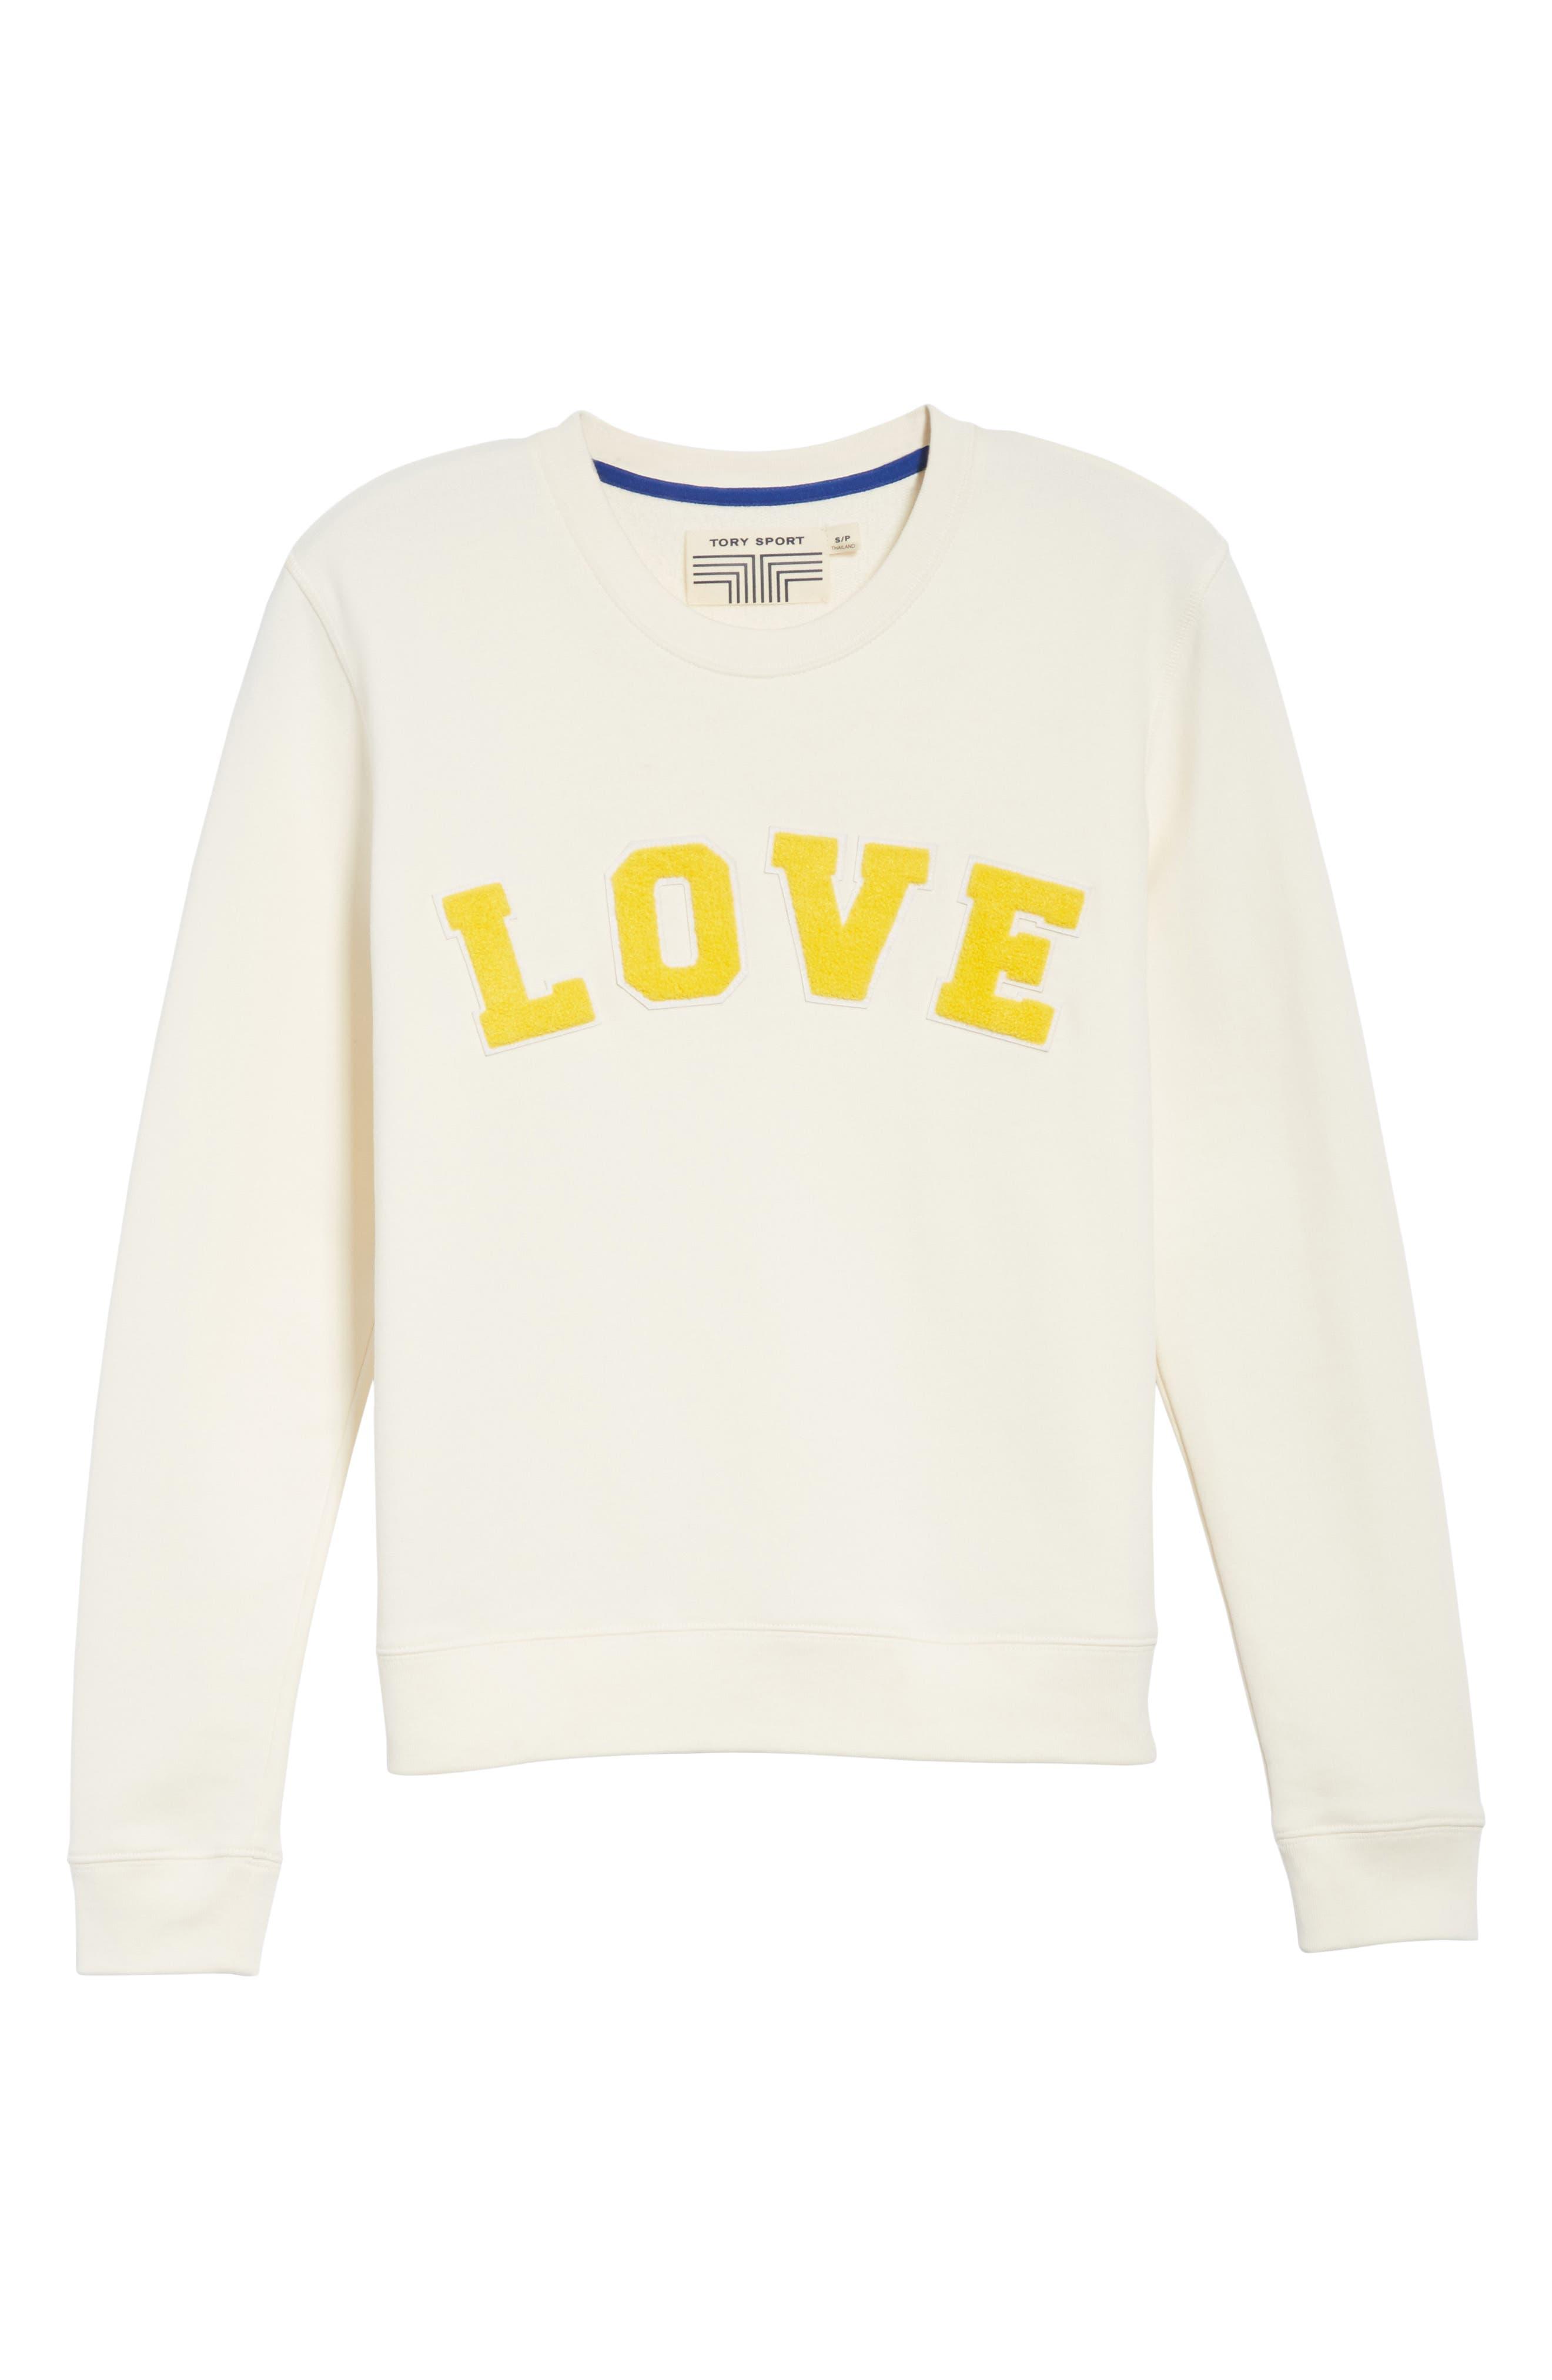 Love Cotton Terry Sweatshirt,                             Alternate thumbnail 6, color,                             IVORY PEARL/ SUNDANCE